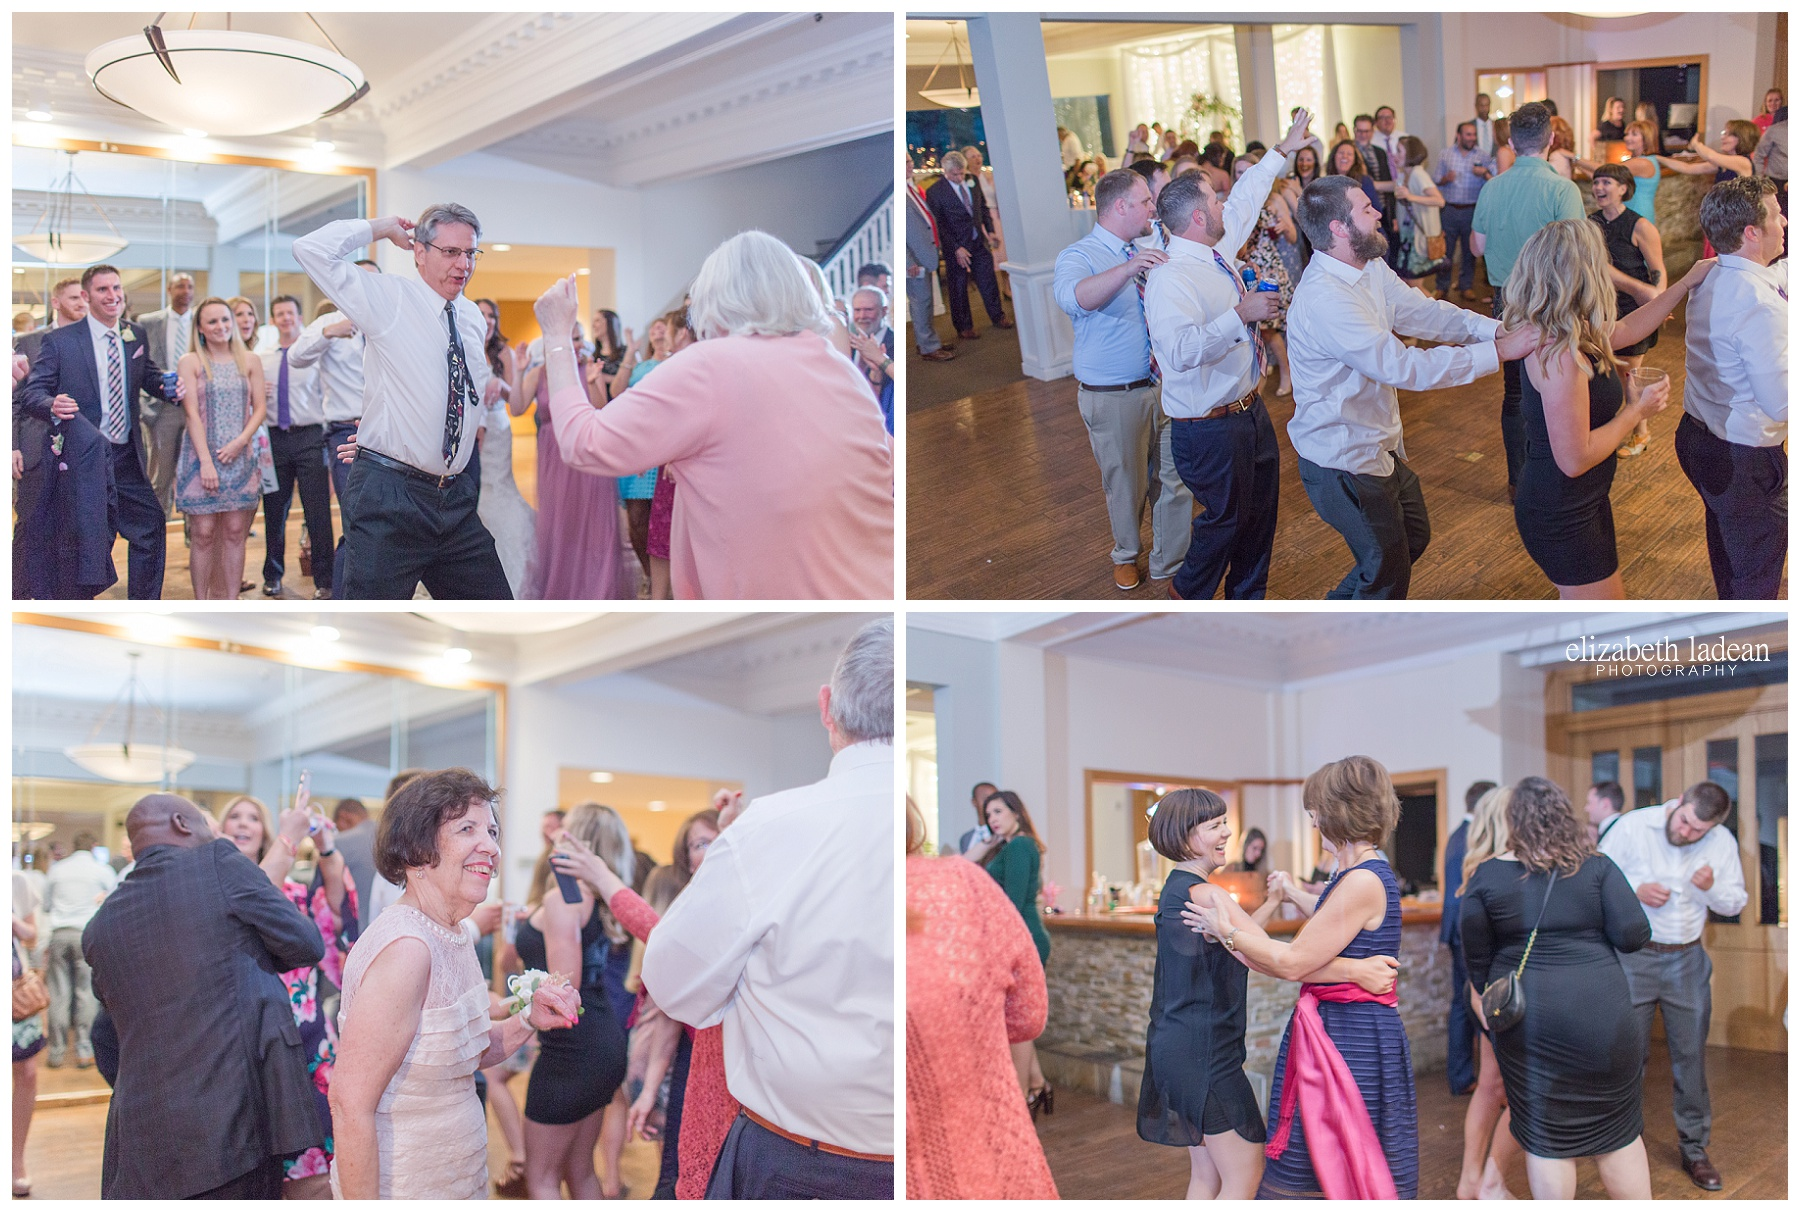 Hillcrest-Country-Club-Kansas-City-Wedding-Photography-E+J-0520-Elizabeth-Ladean-Photography-photo_0888.jpg